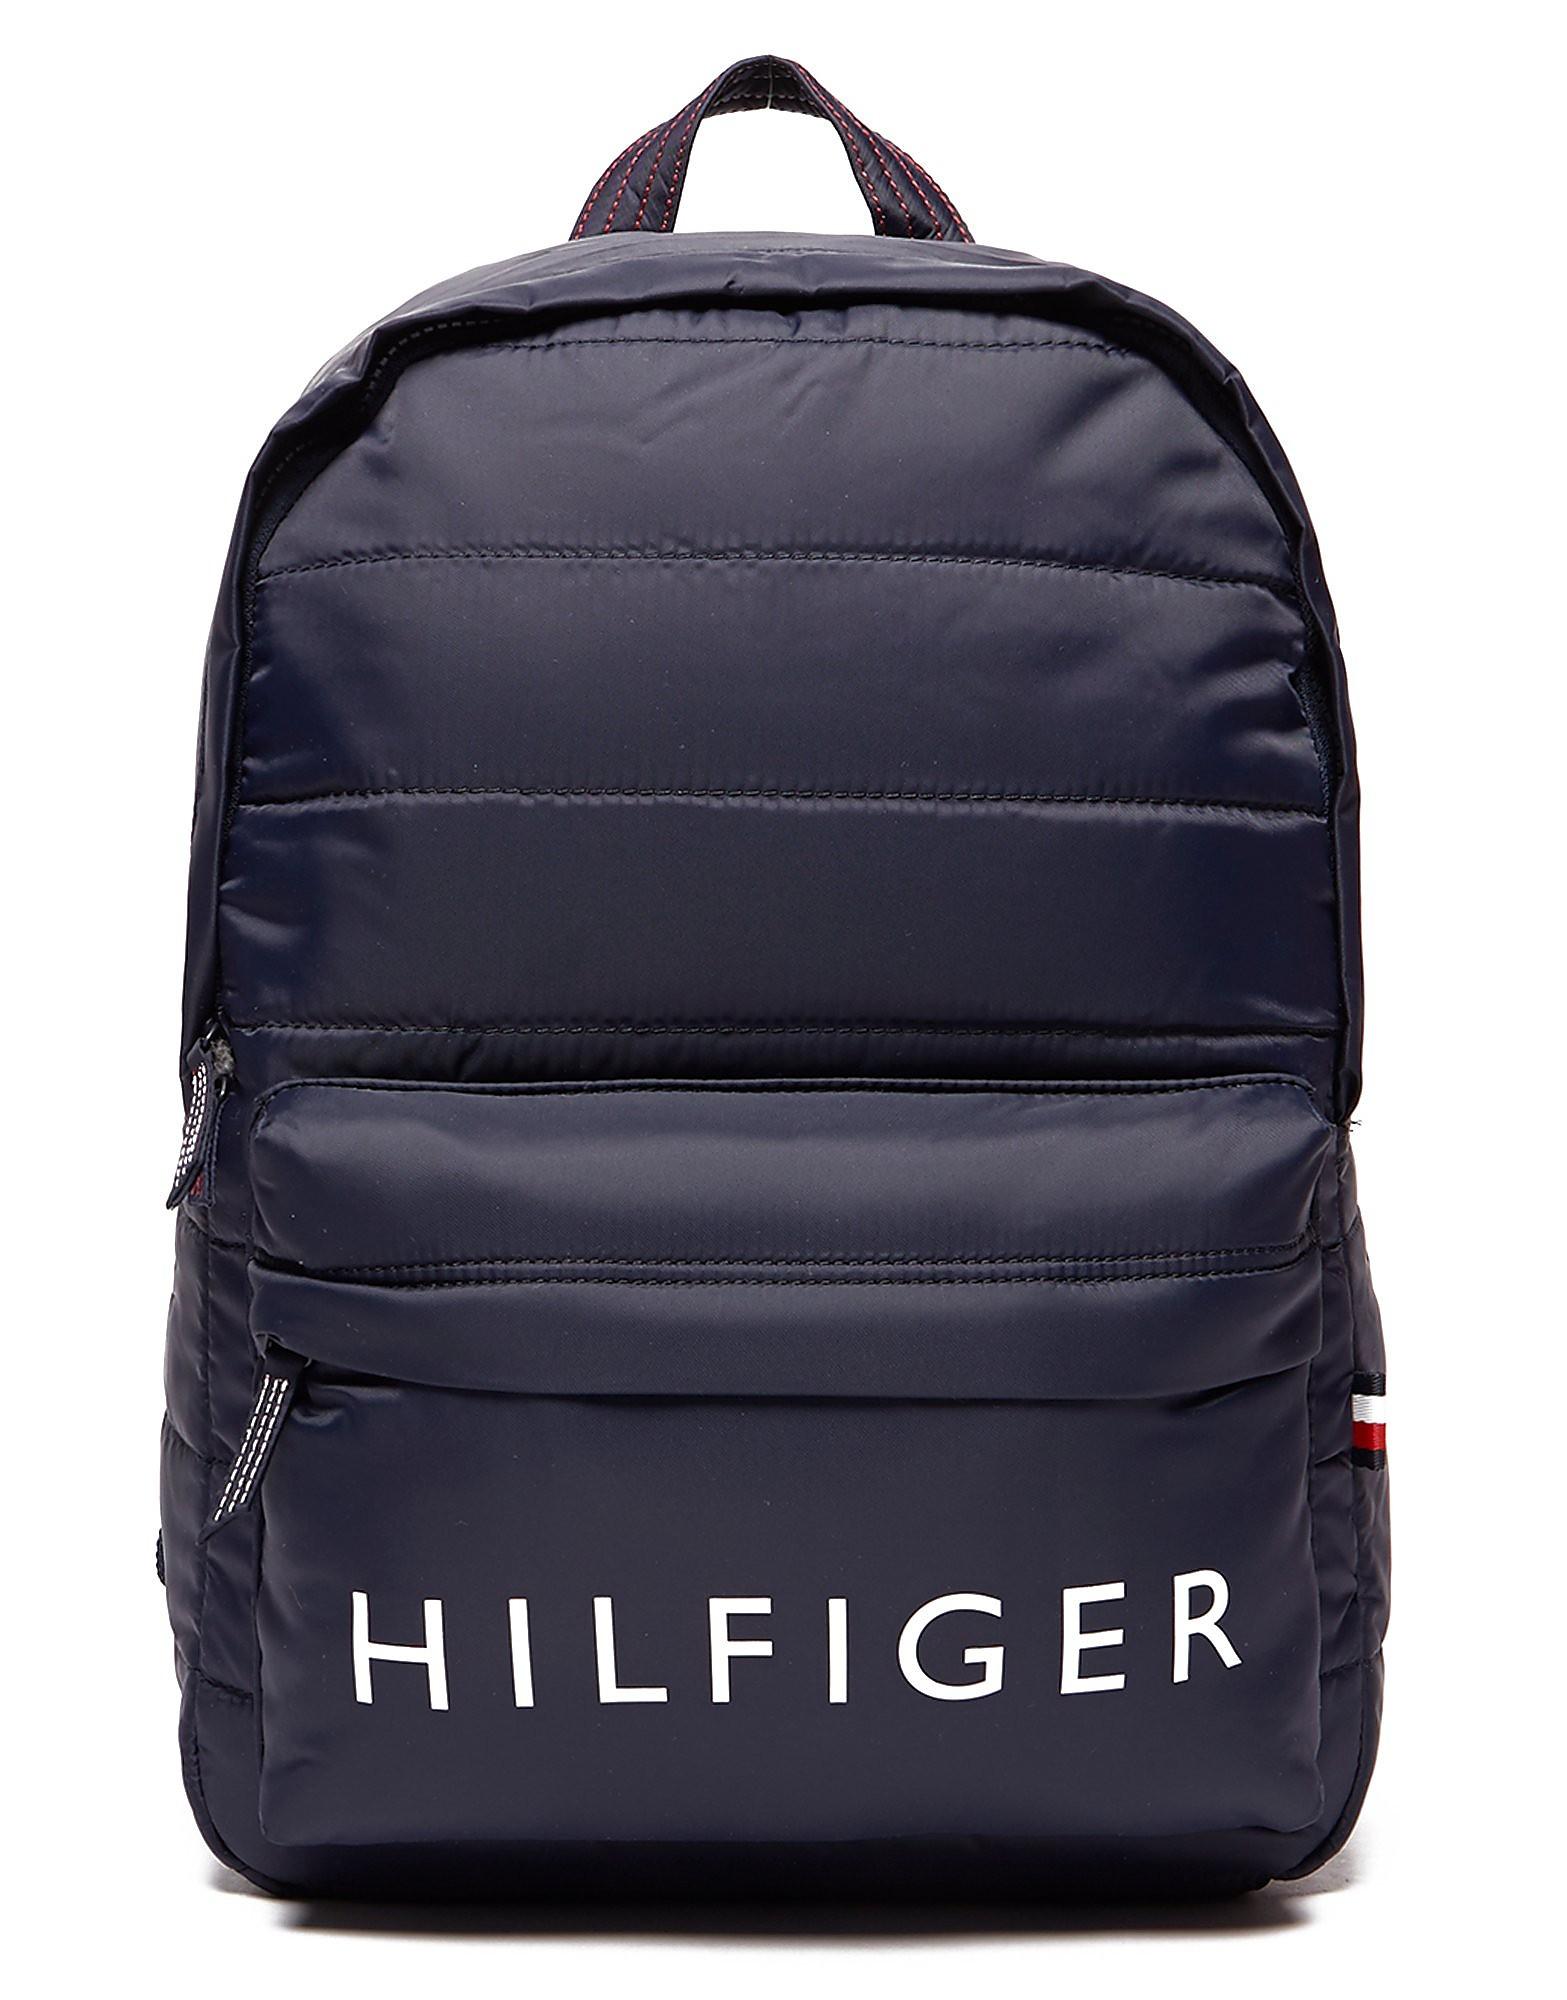 Tommy Hilfiger Nylon Backpack